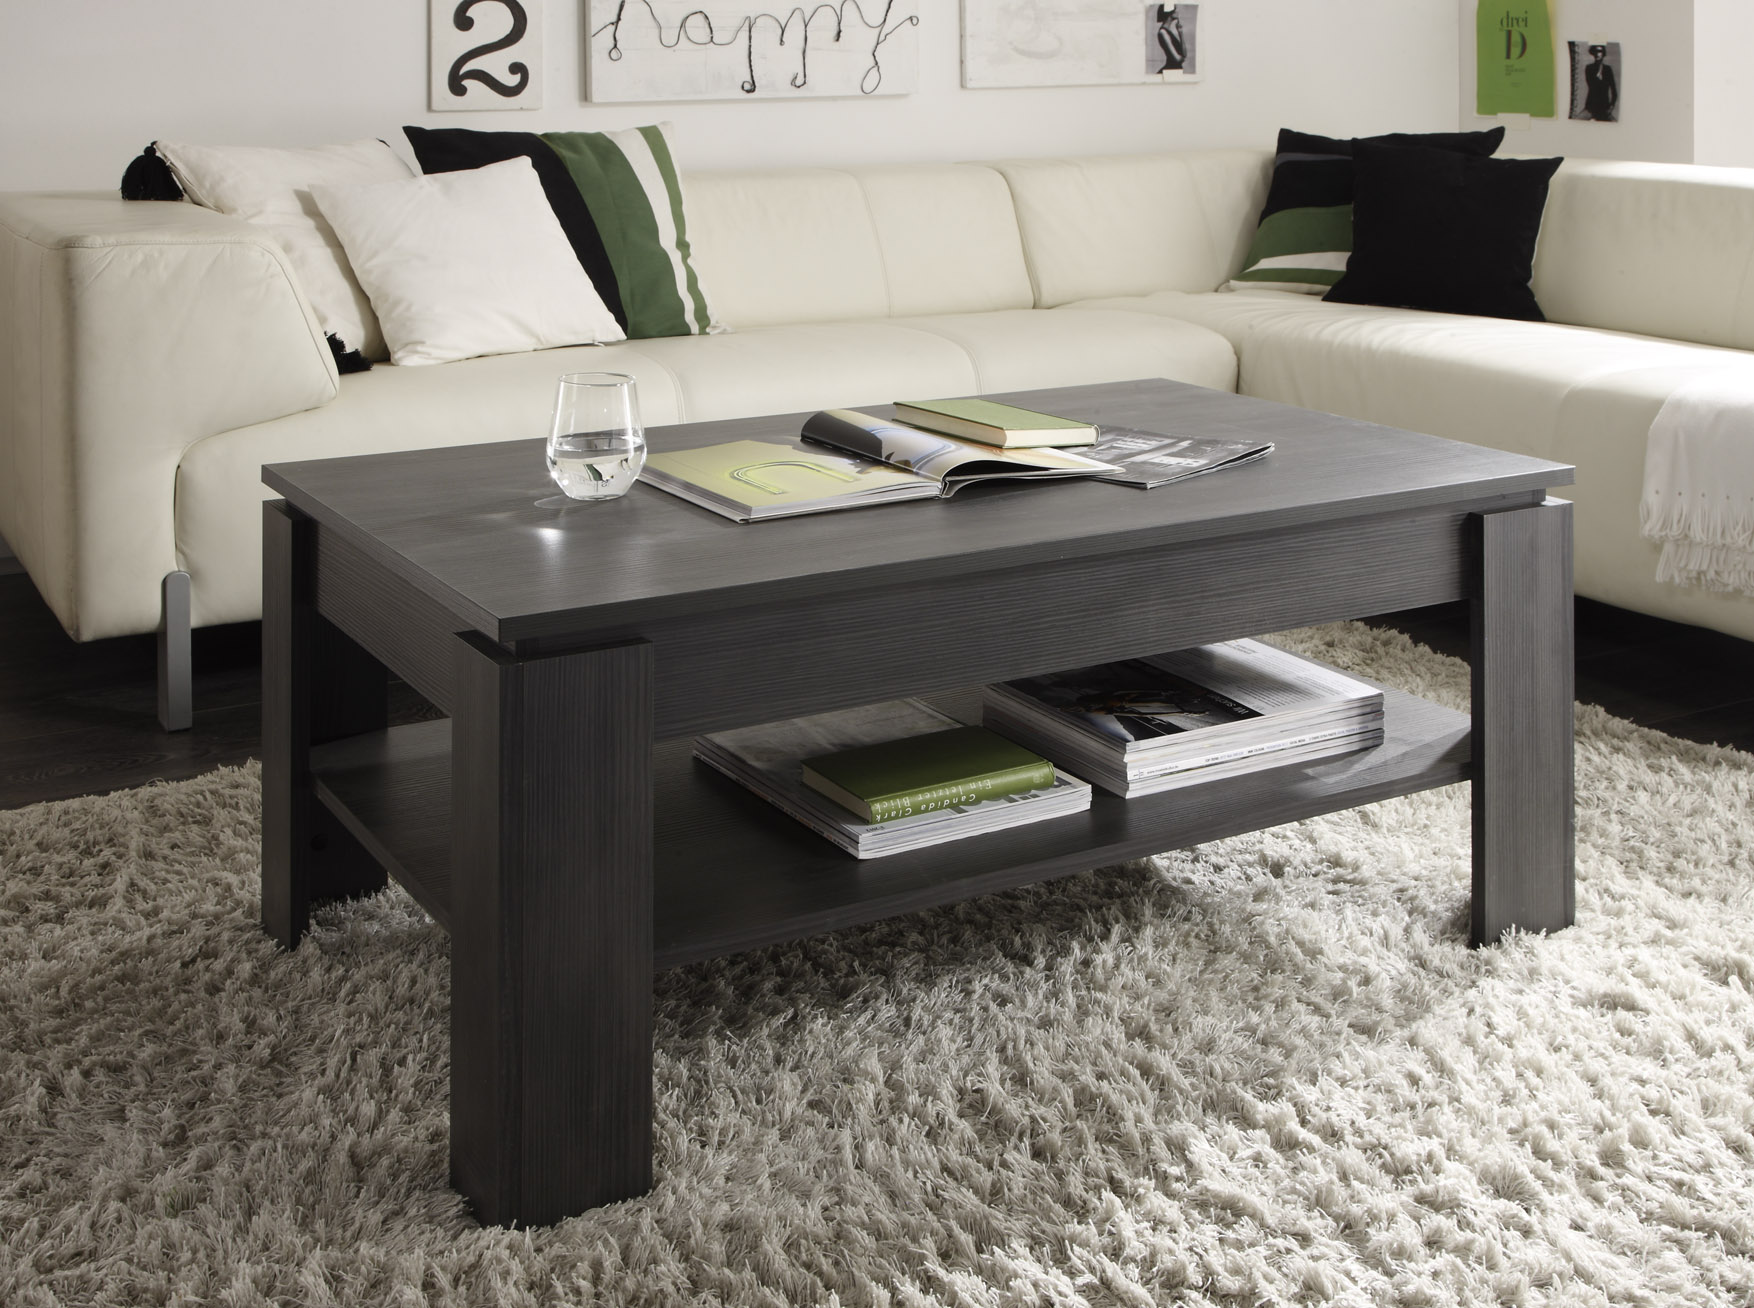 wohnkombination wohnwand esche grau wei 4teilig. Black Bedroom Furniture Sets. Home Design Ideas